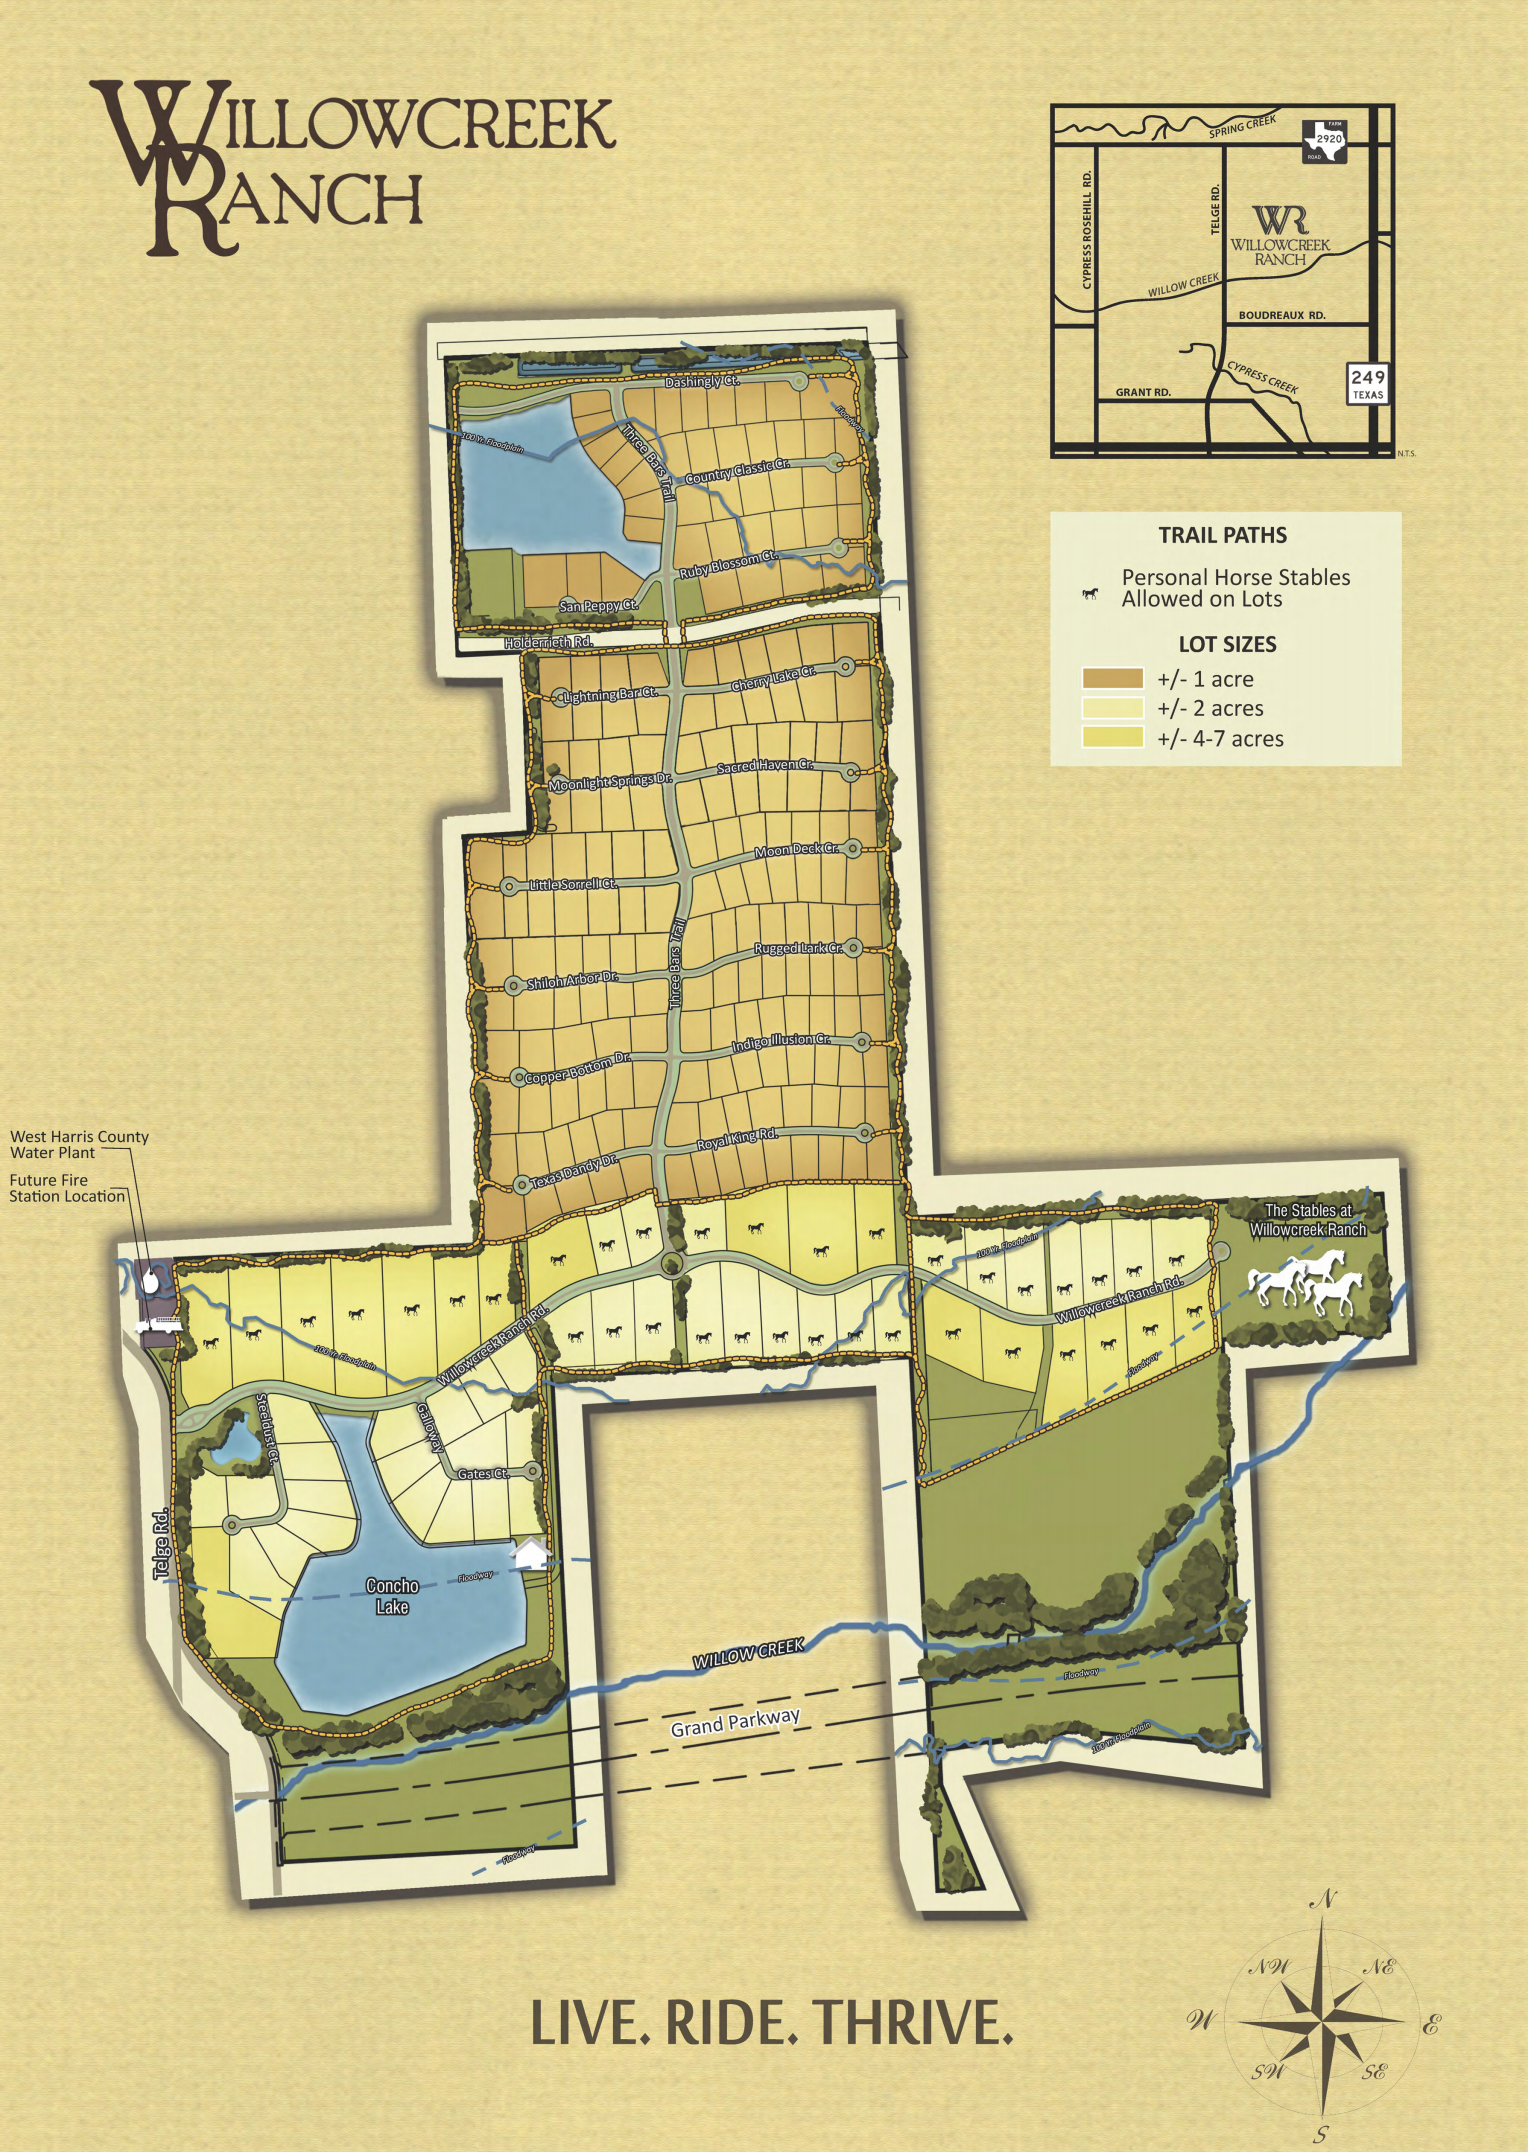 willowcreek ranch map